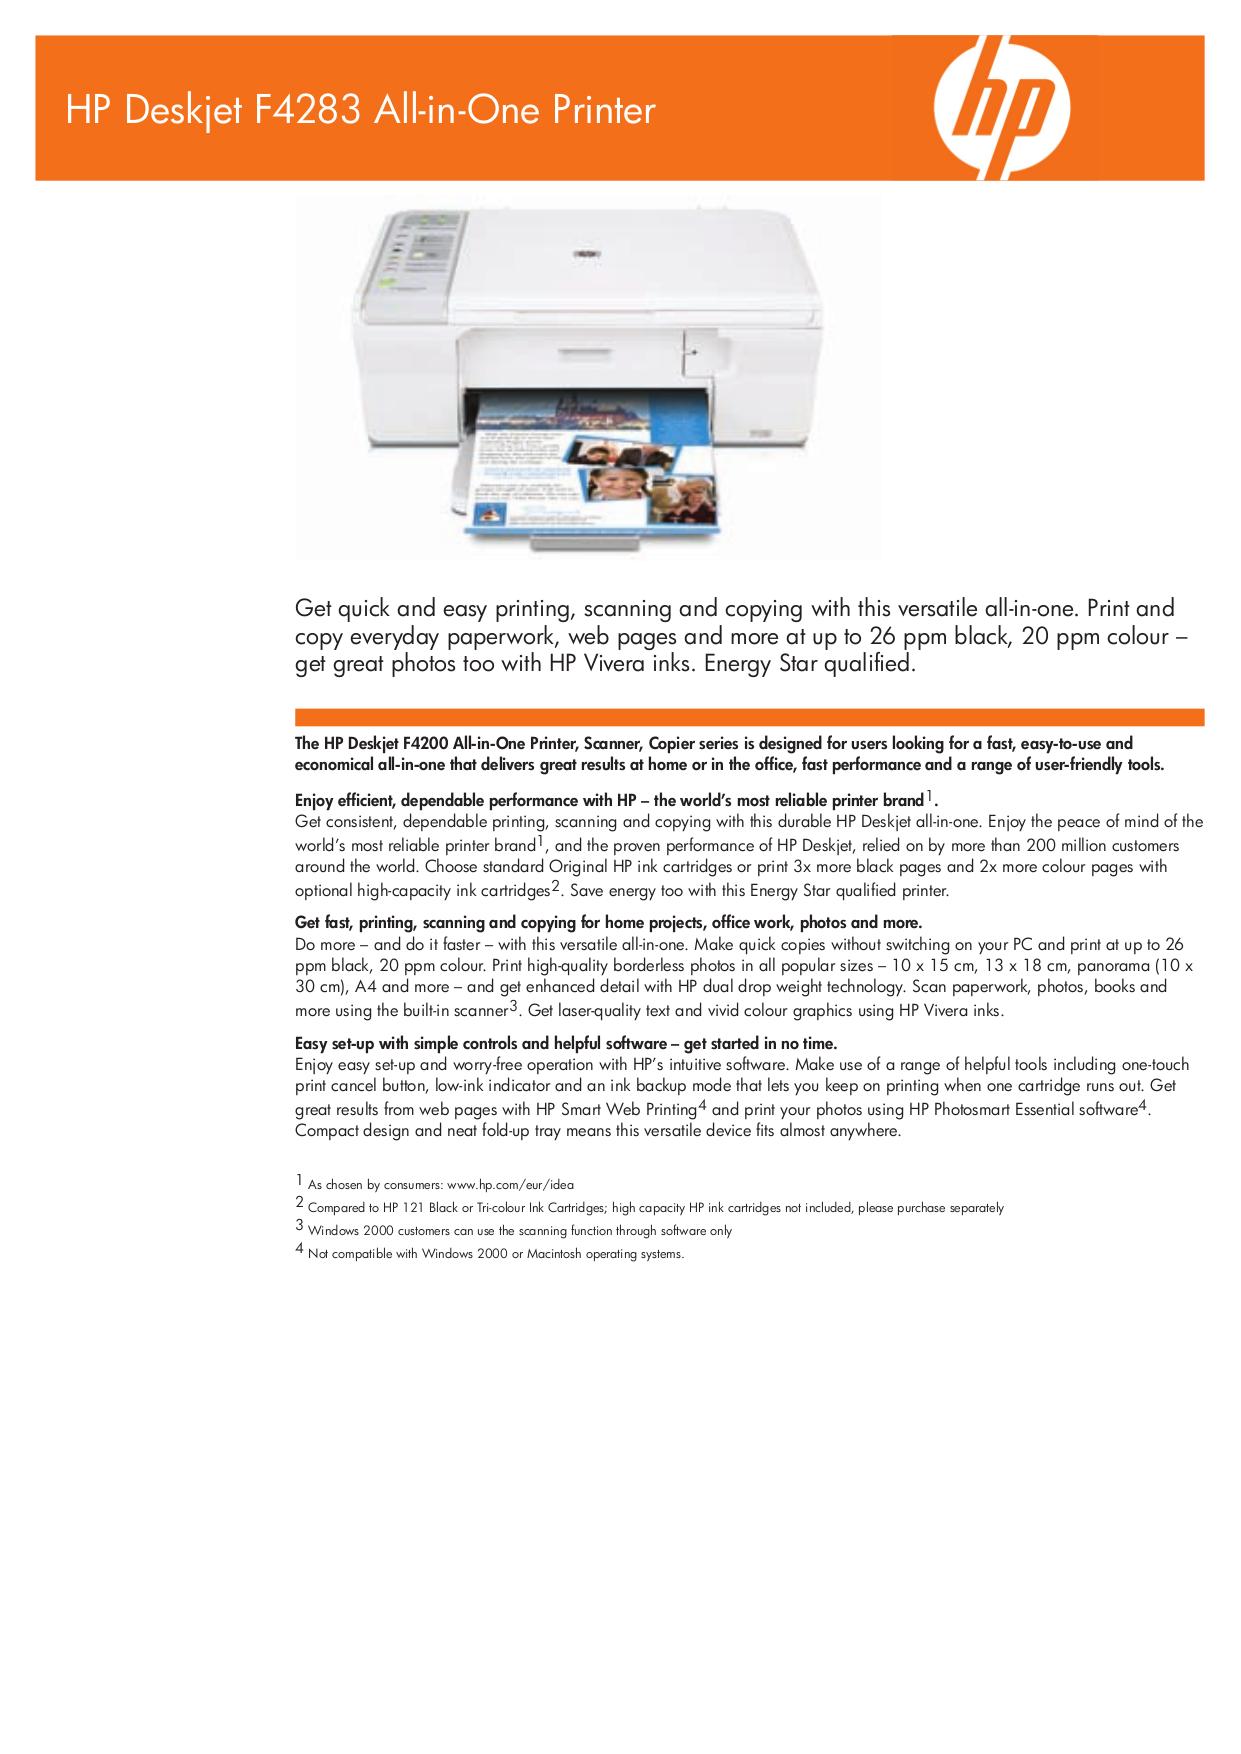 pdf for HP Multifunction Printer Deskjet F4283 manual